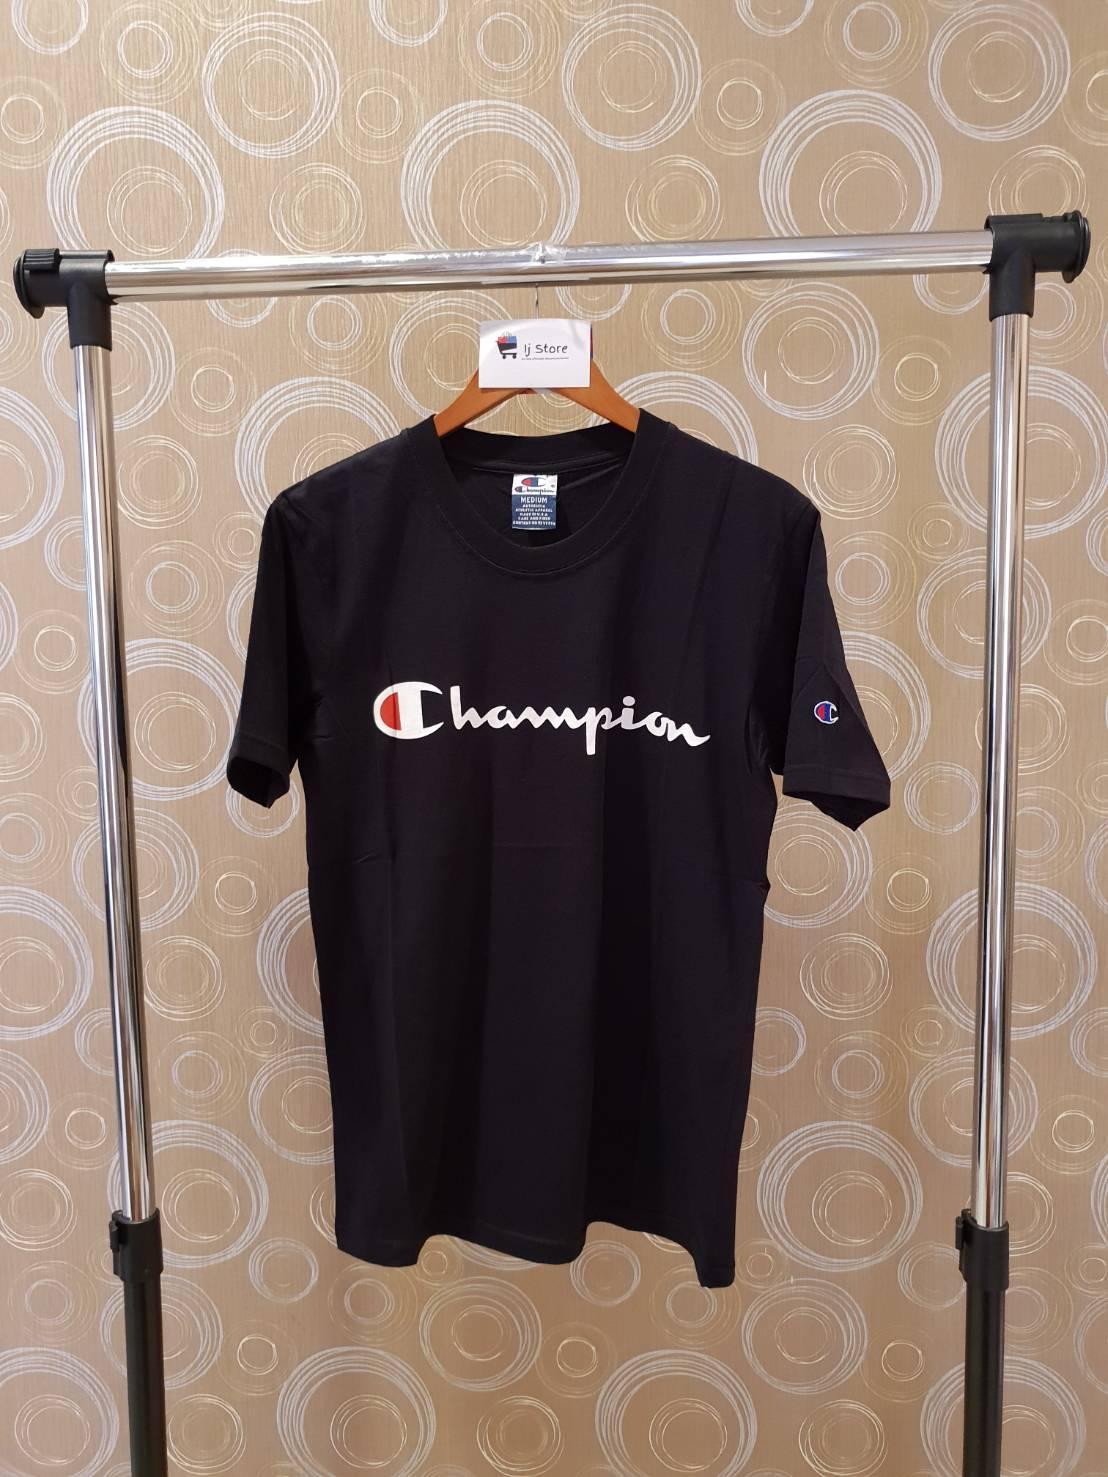 Kaos champion logo import distro high quality hitam unisex